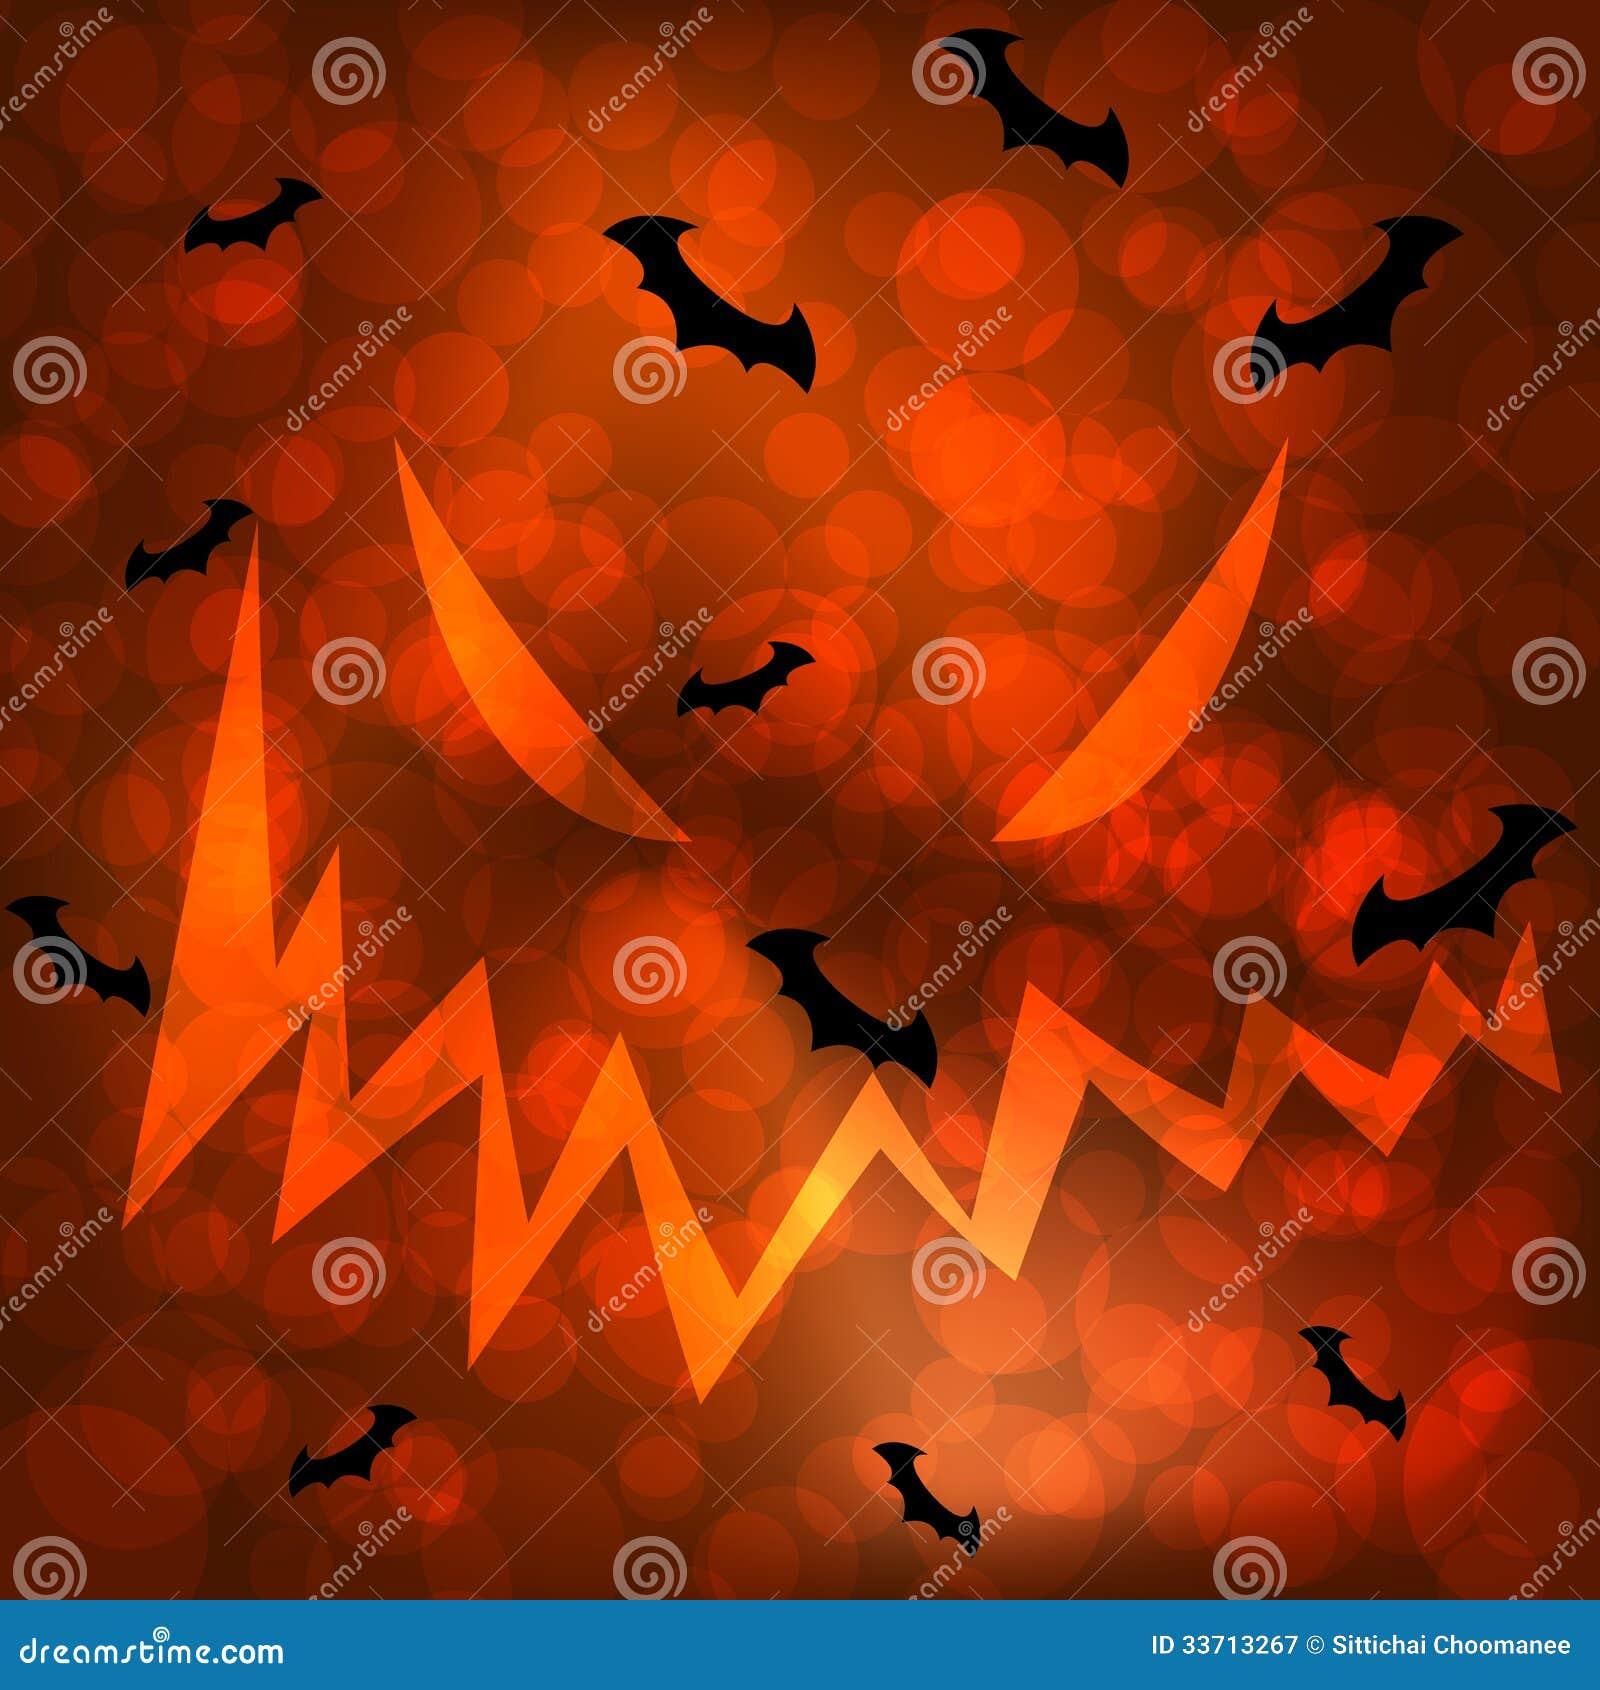 Halloween Desktop Backgrounds Stock Vector Illustration Of Backgrounds Animal 33713267